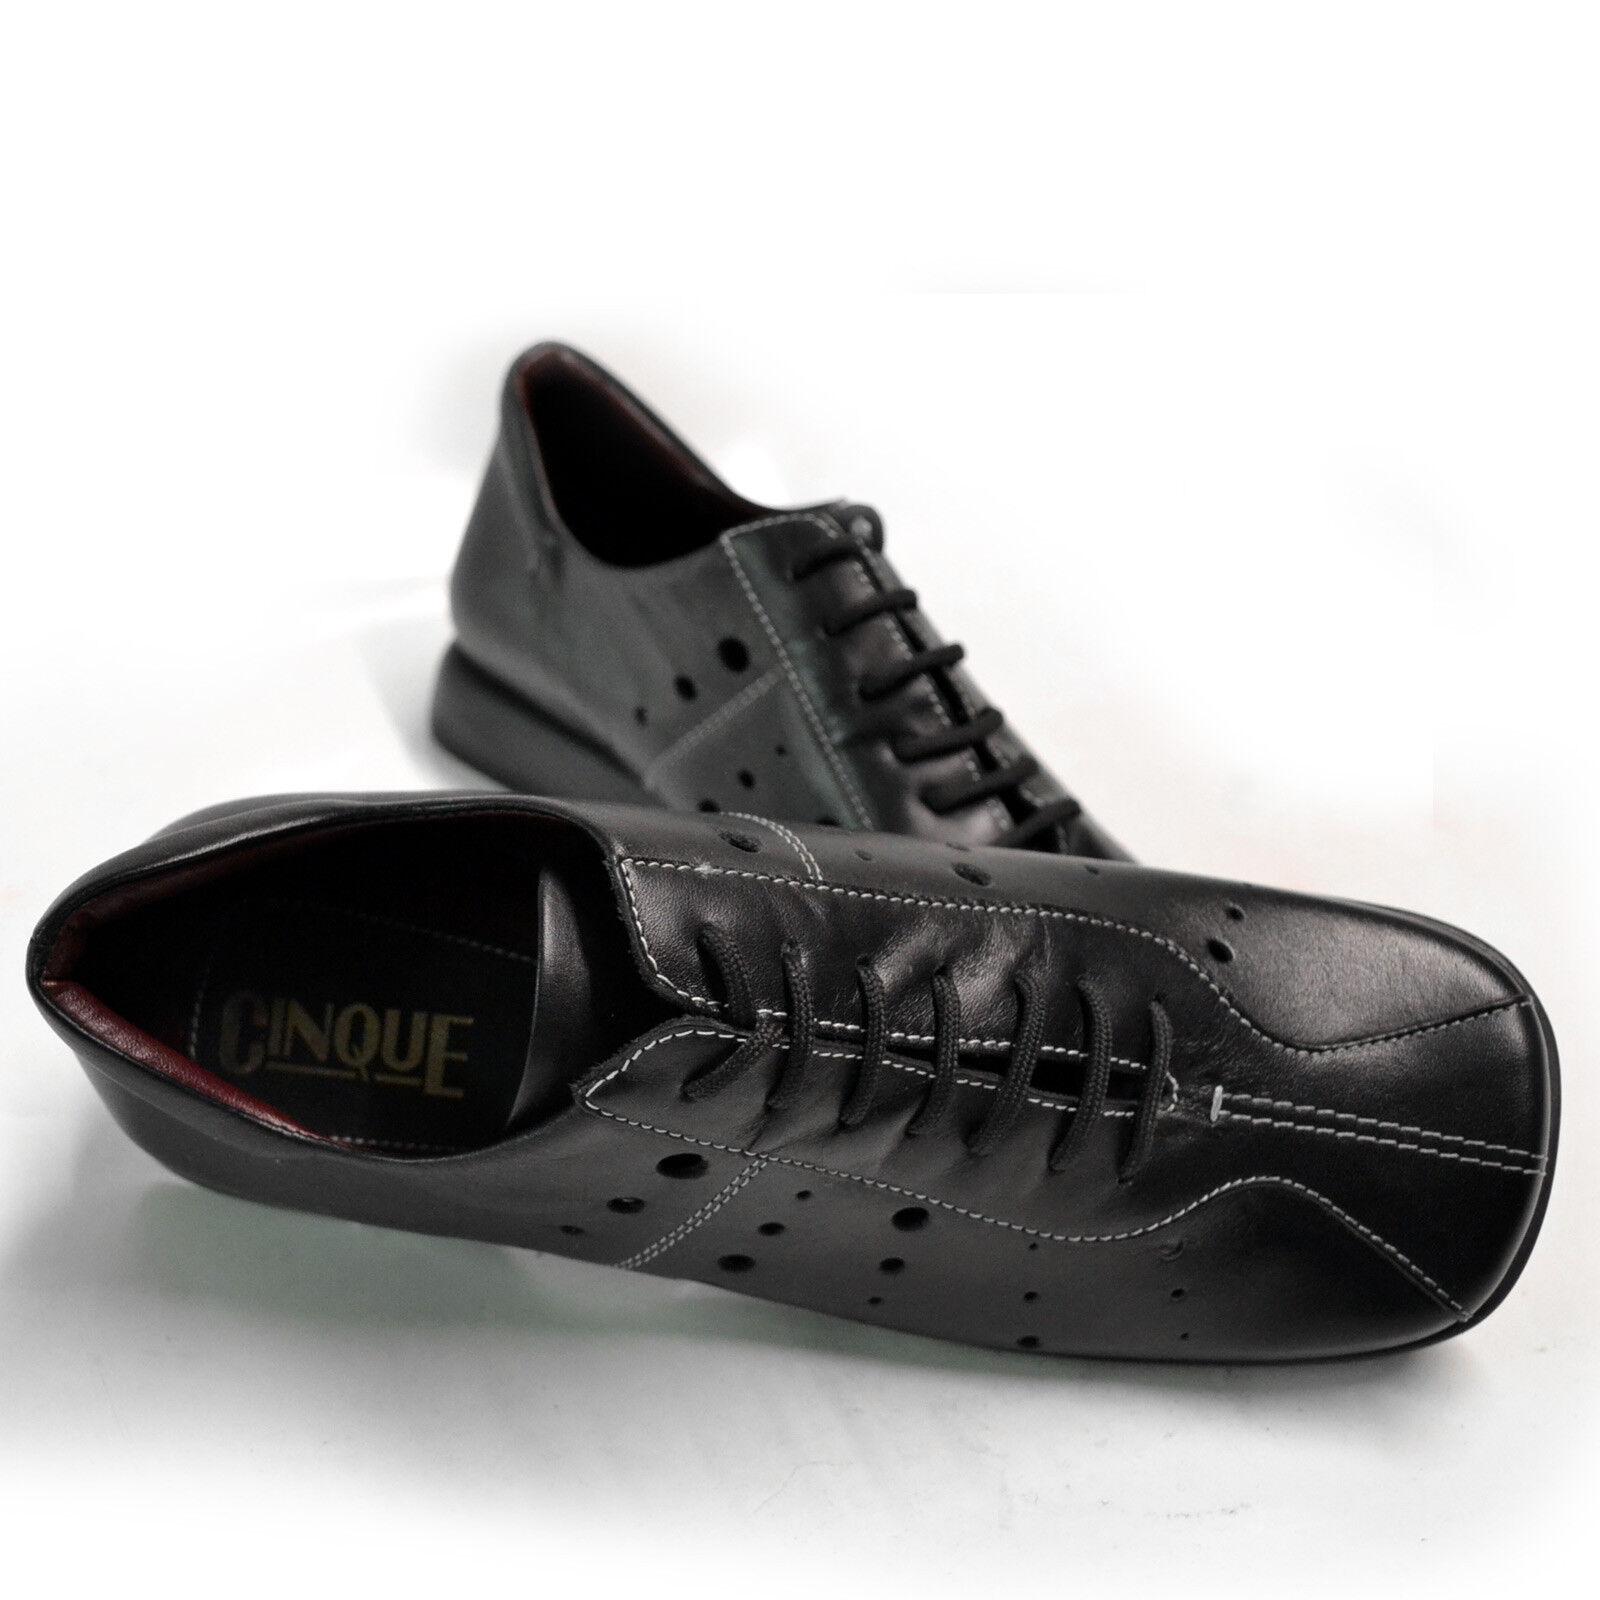 Donna cinque de italiana metà scarpa Nero de cinque 39 2db4a9